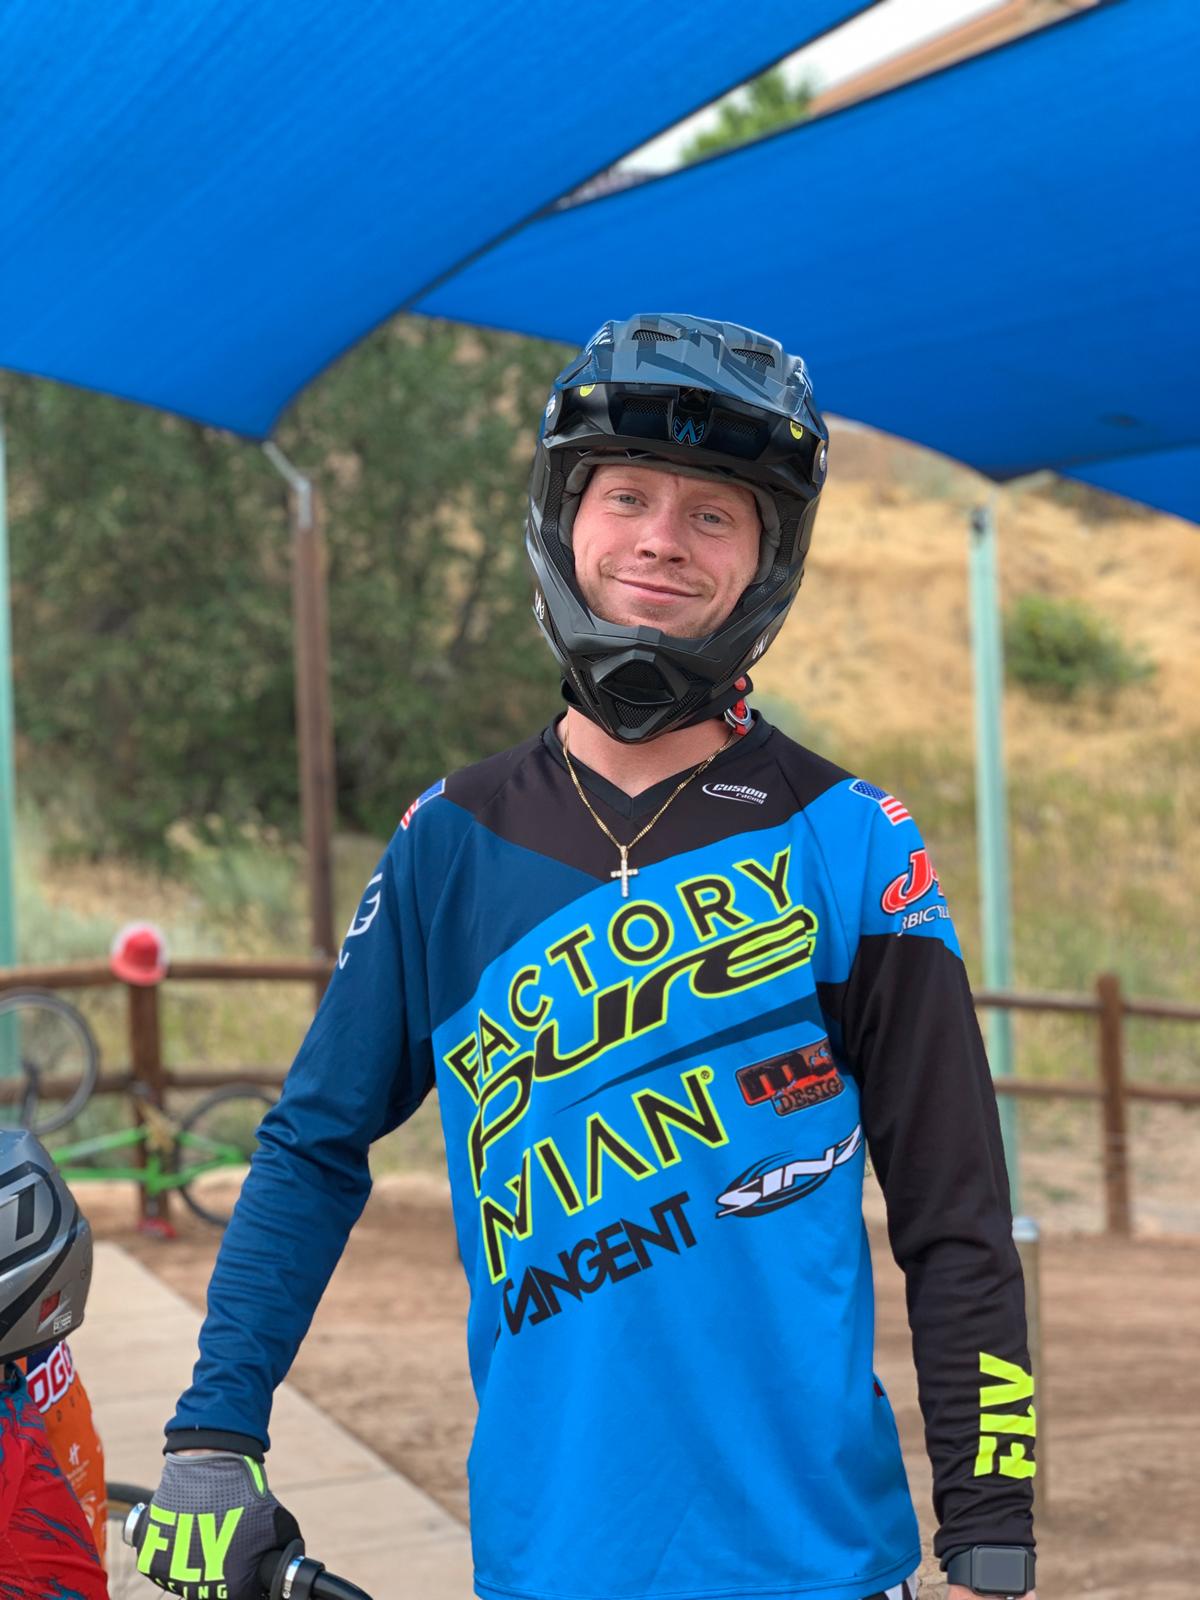 Hayden Raymond is a pro BMX rider living in Durango, Colorado. Photo courtesy Hayden Raymond